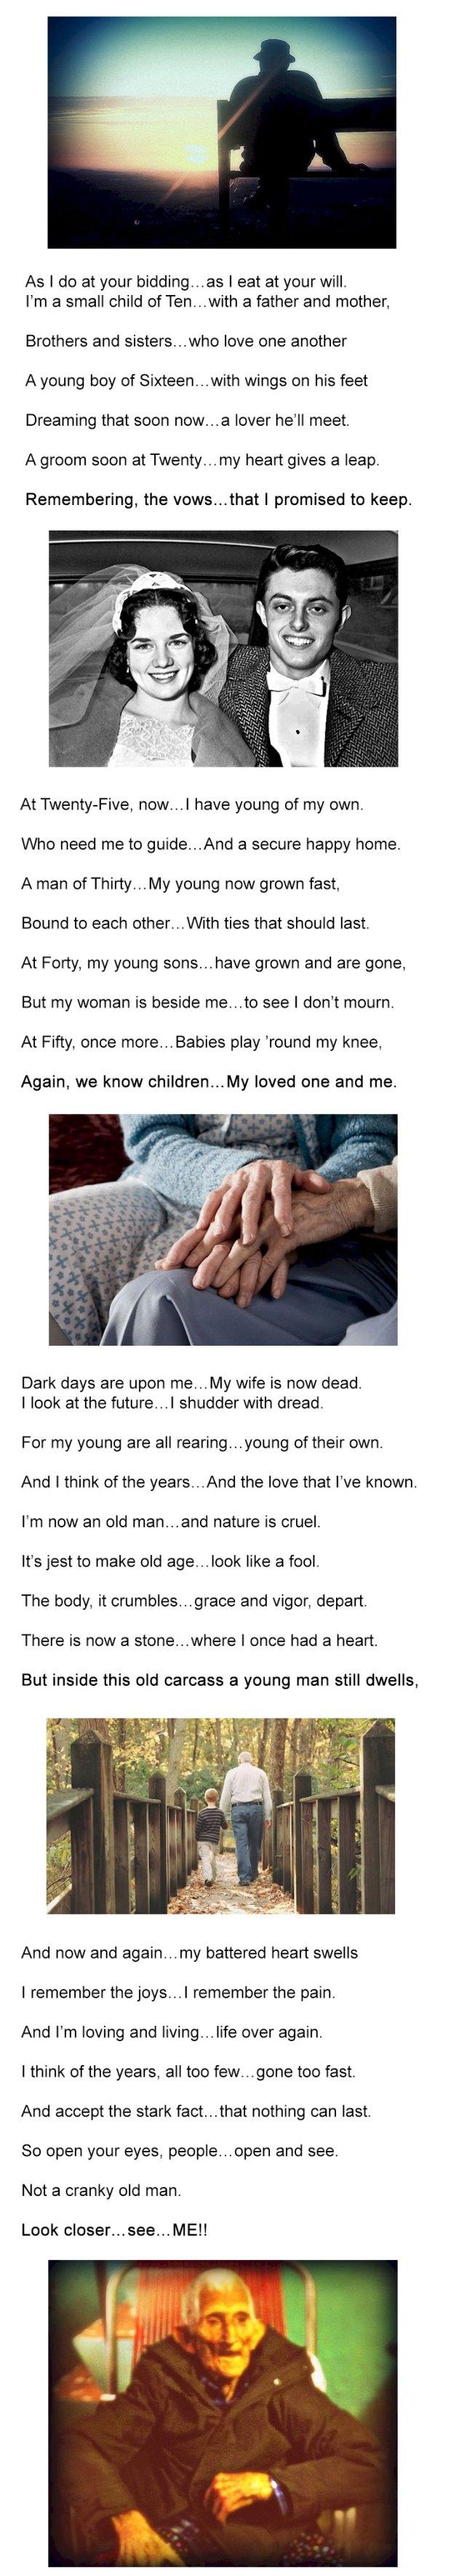 Cranky Old Man Poem